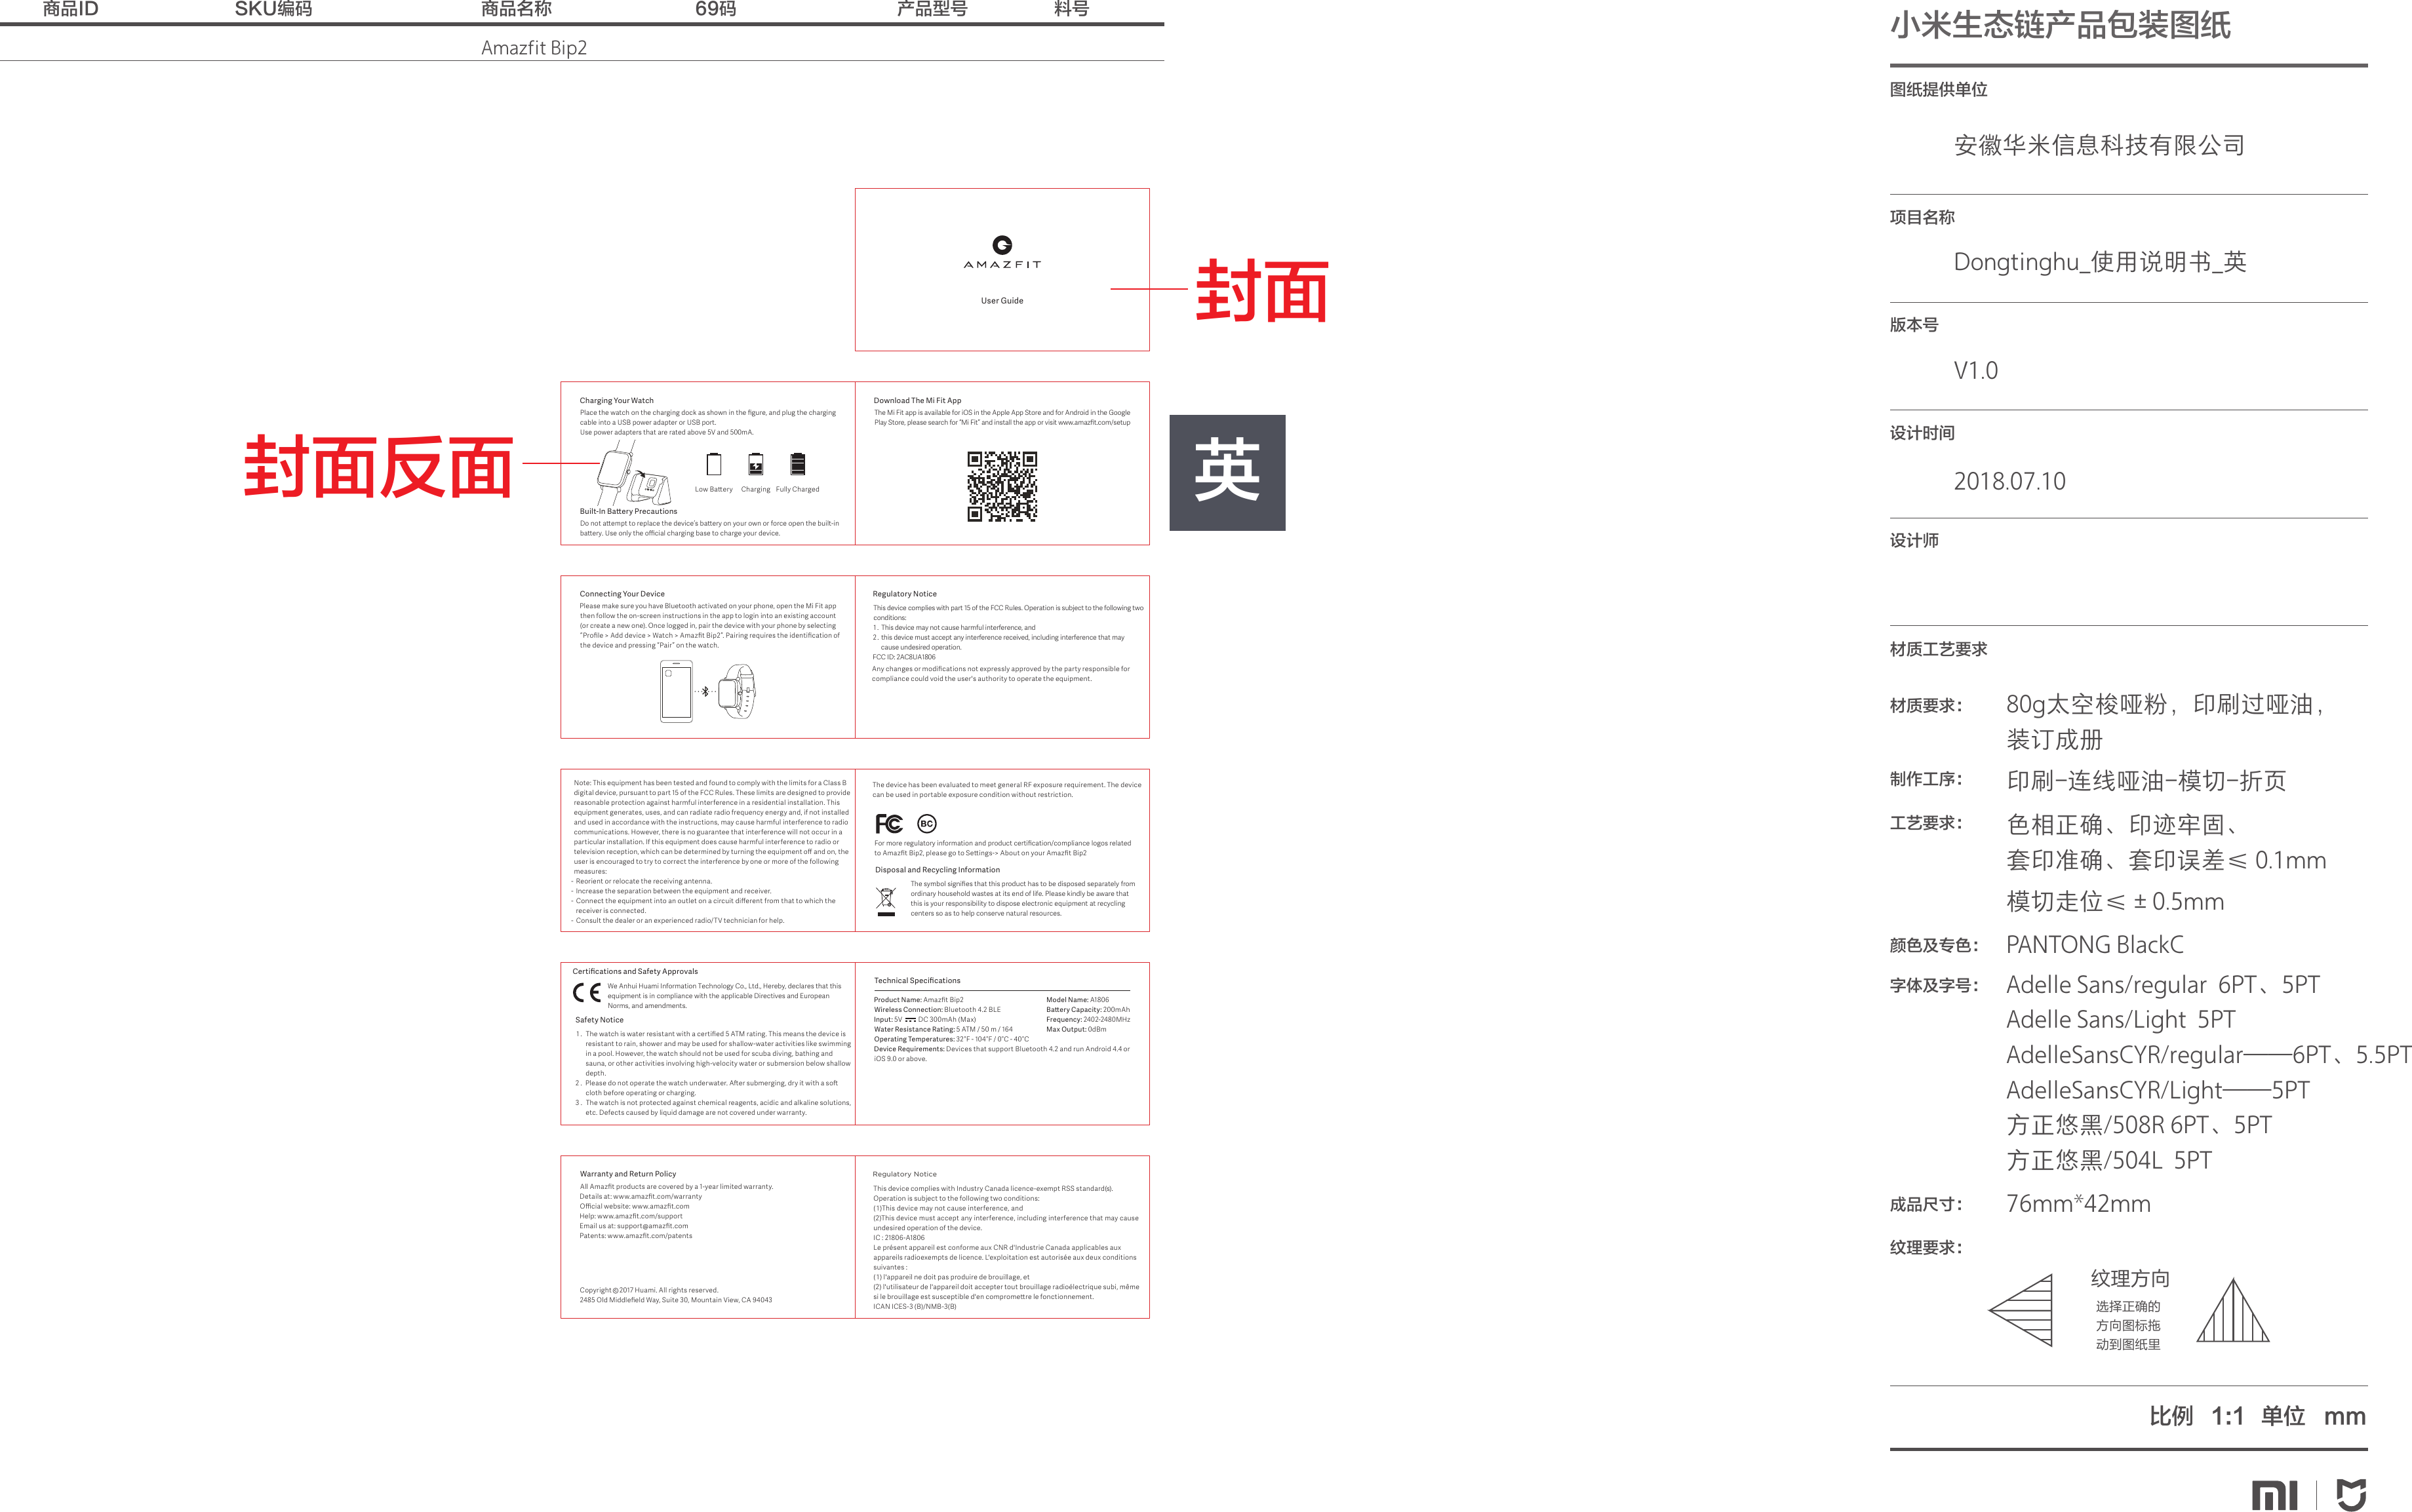 Anhui Huami Information Technology A1806 Amazfit Bip 2 User